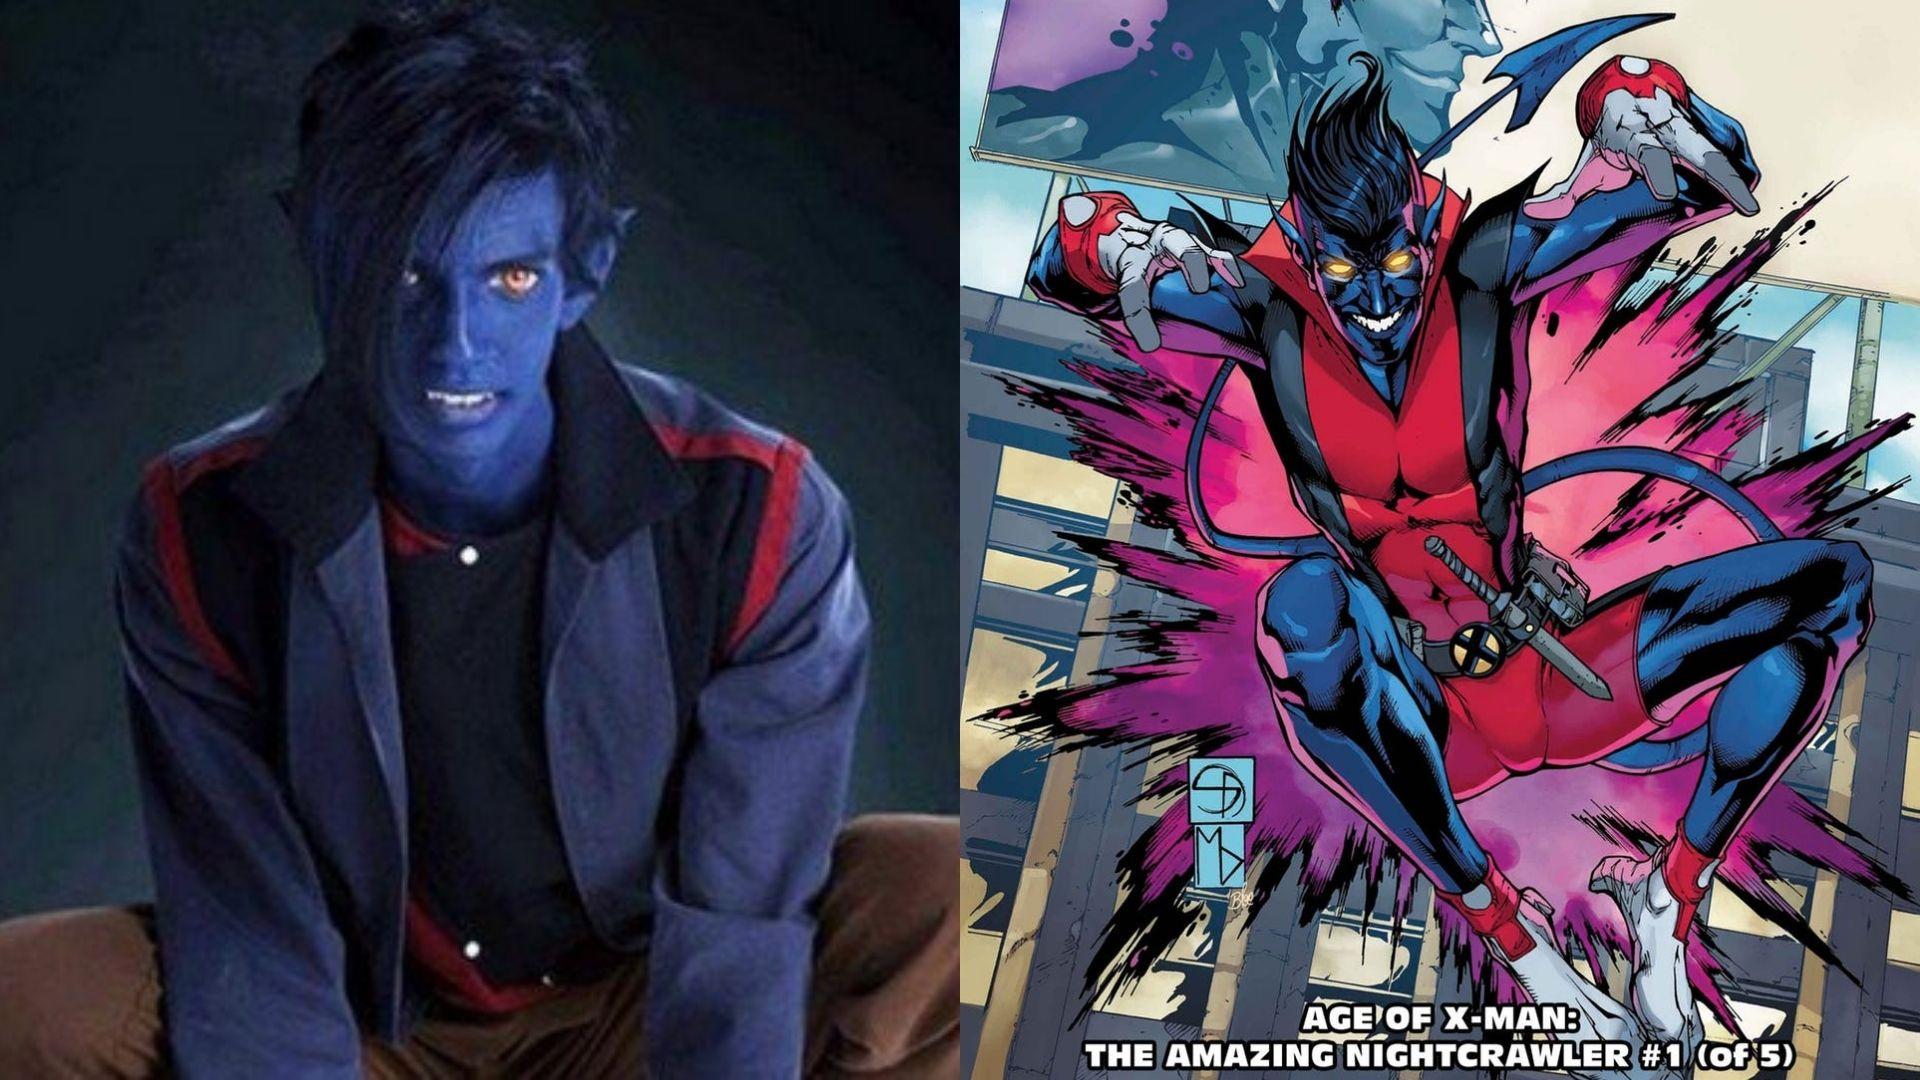 【X-MEN】ナイトクローラーの強さ・能力・誕生・活躍について解説!【マーベル原作】